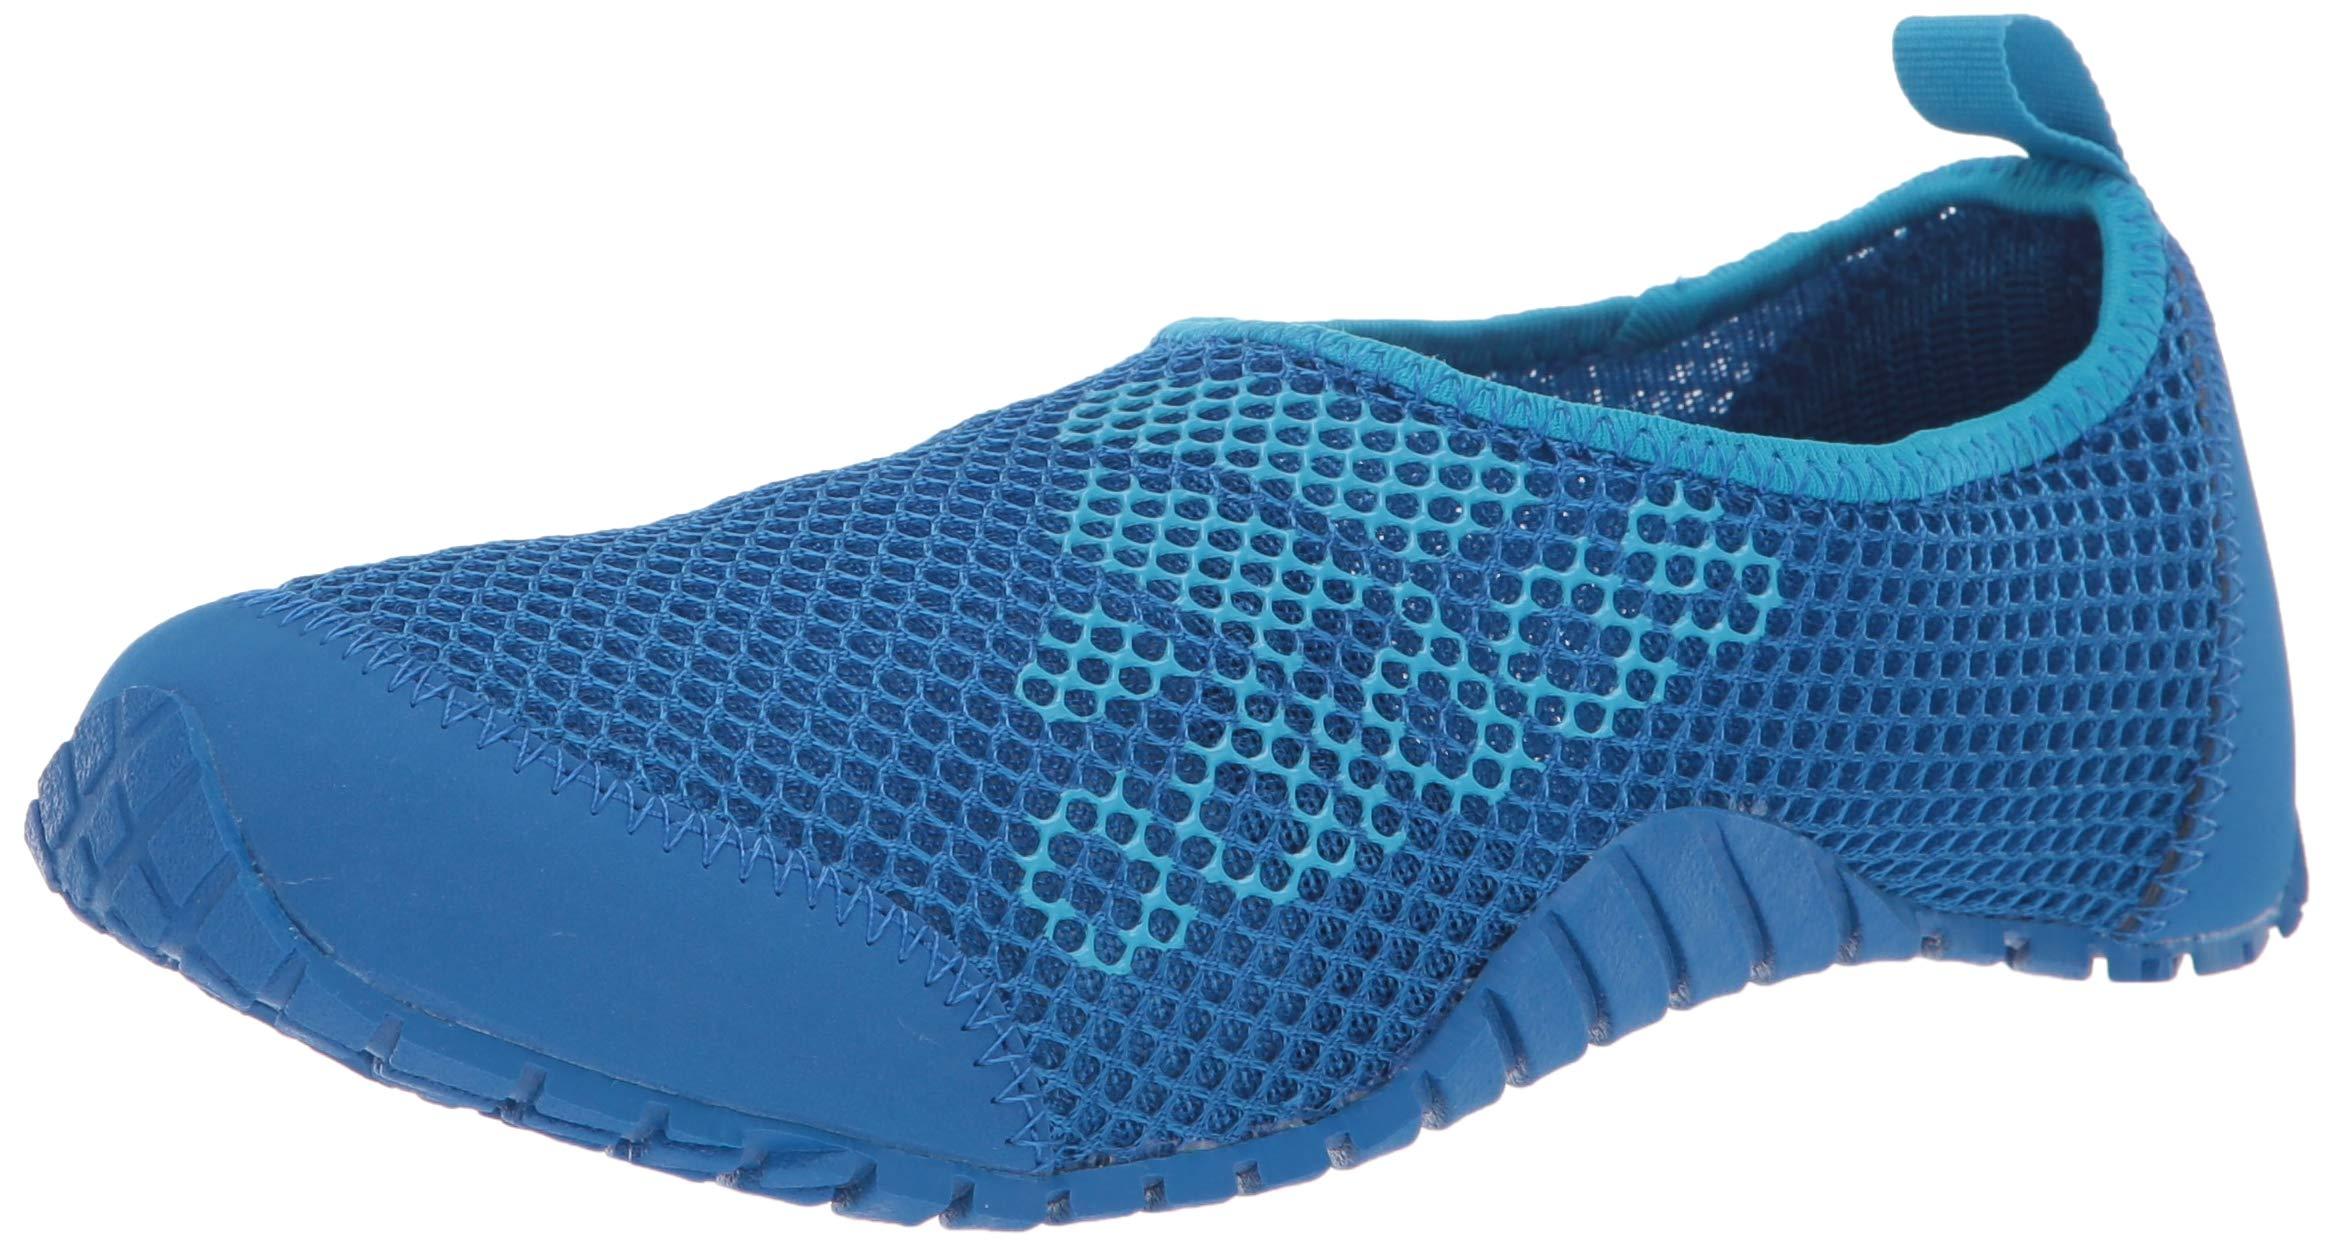 adidas outdoor KUROBE Kids Water Sports Shoe Walking Blue Beauty/Shock Cyan, 4 Child US Big